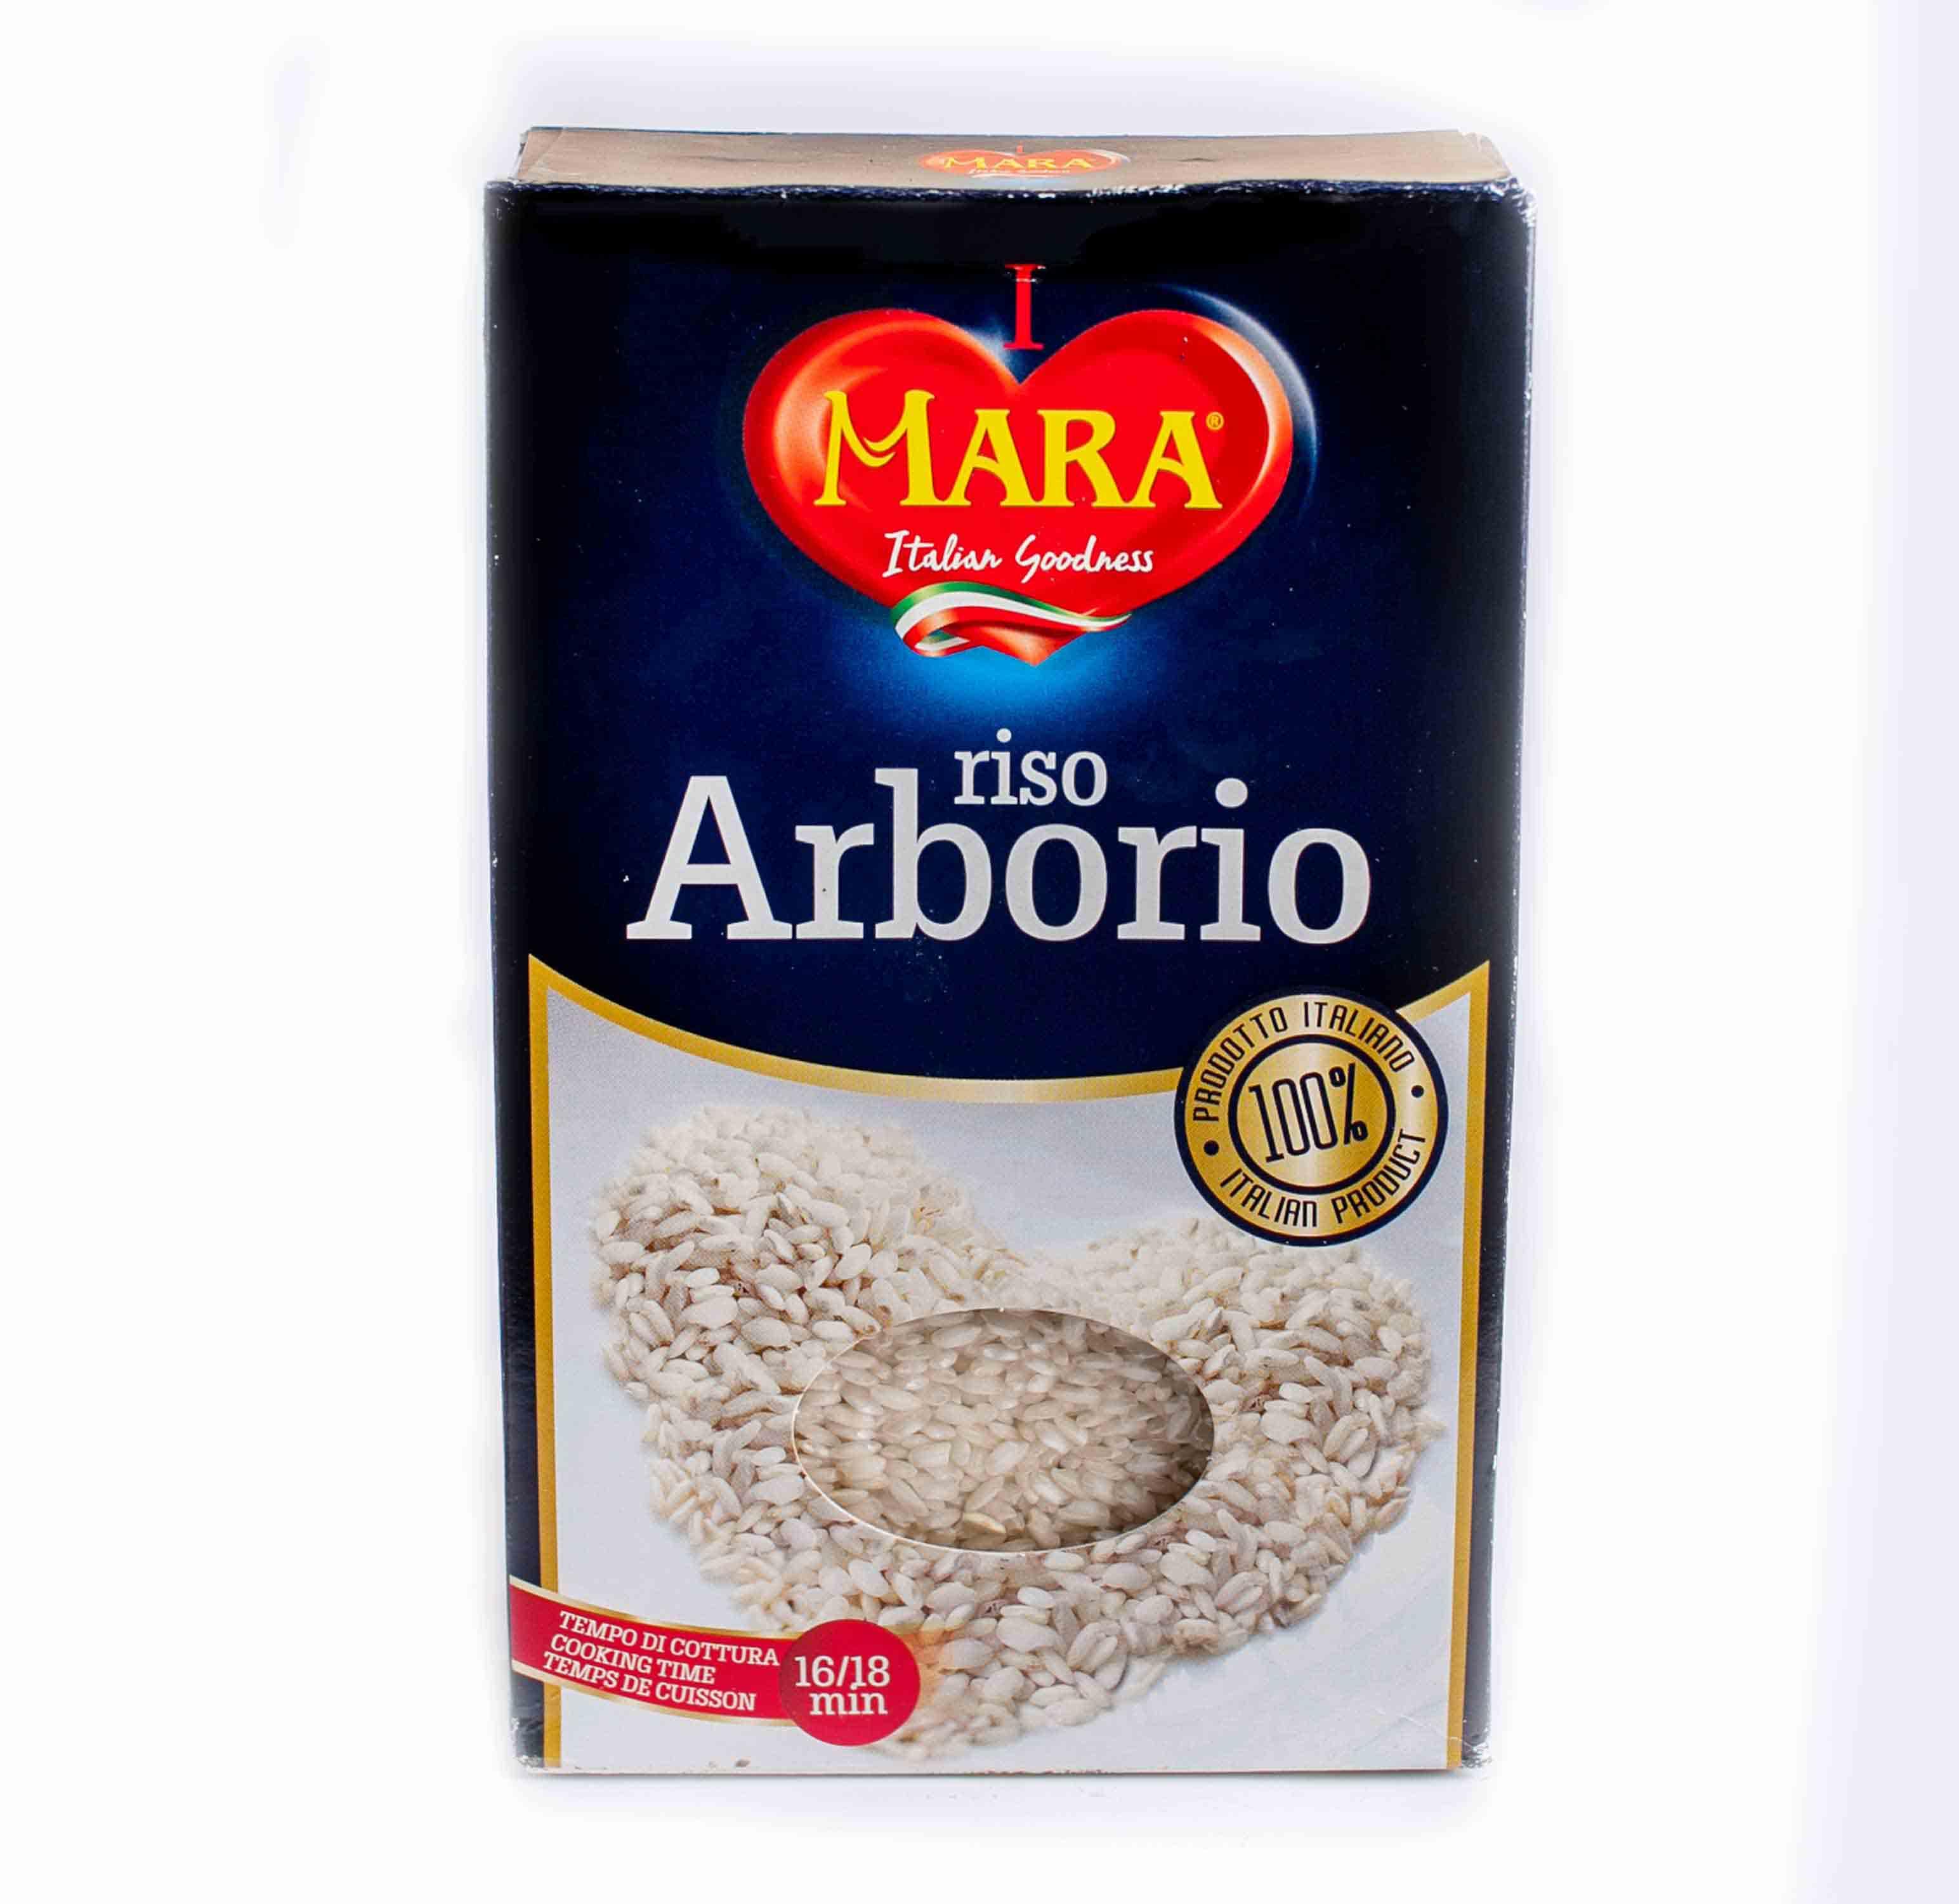 MARA Arborio Düyü 1kg